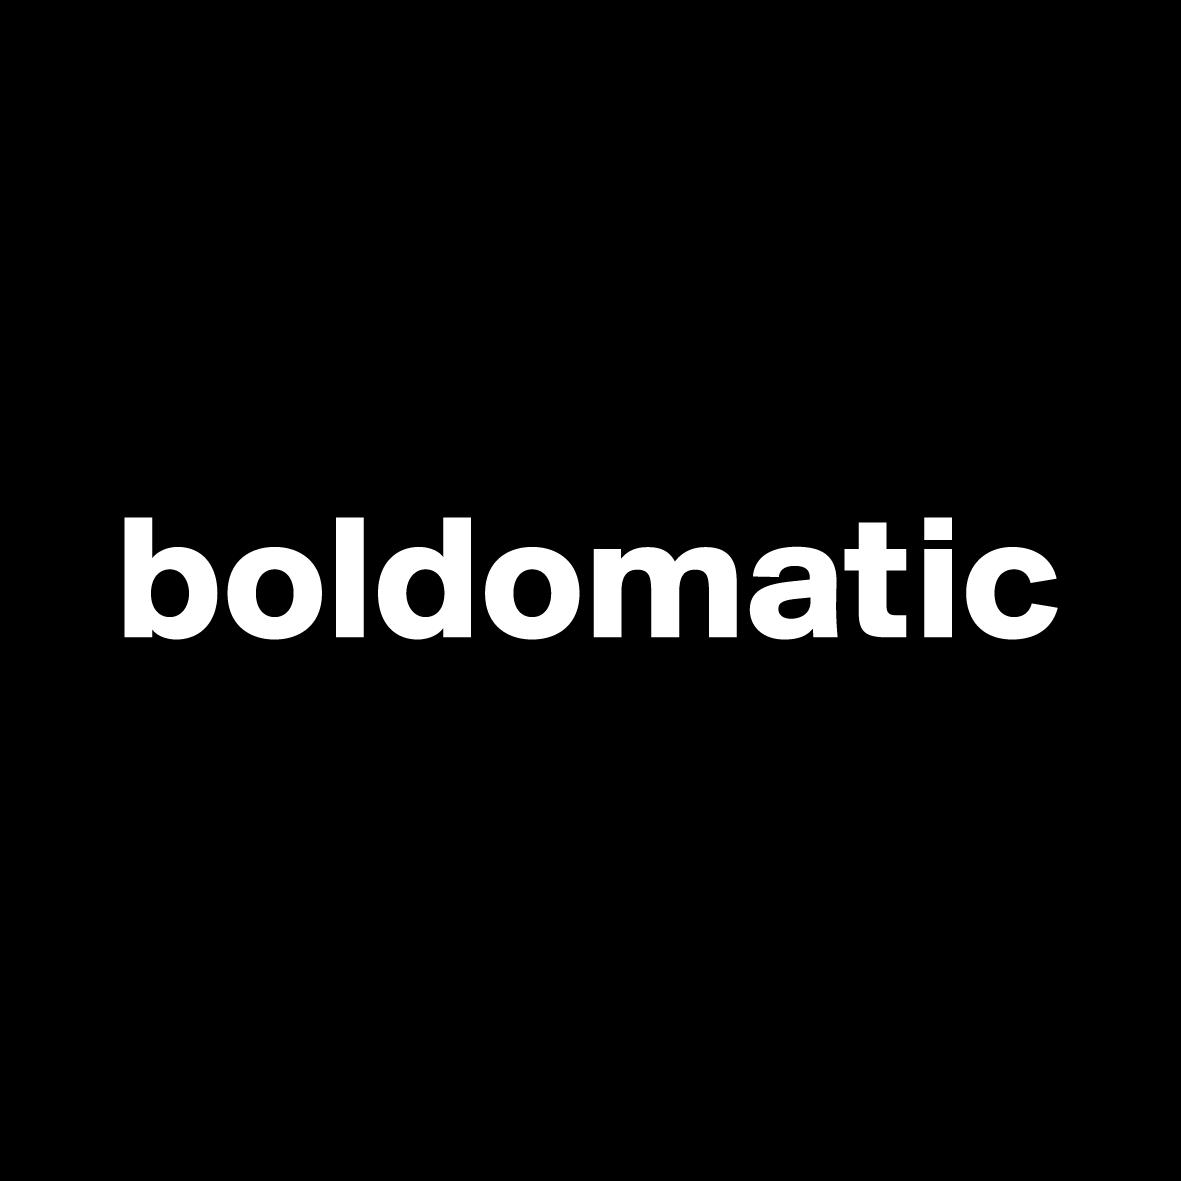 Boldomatic Logo